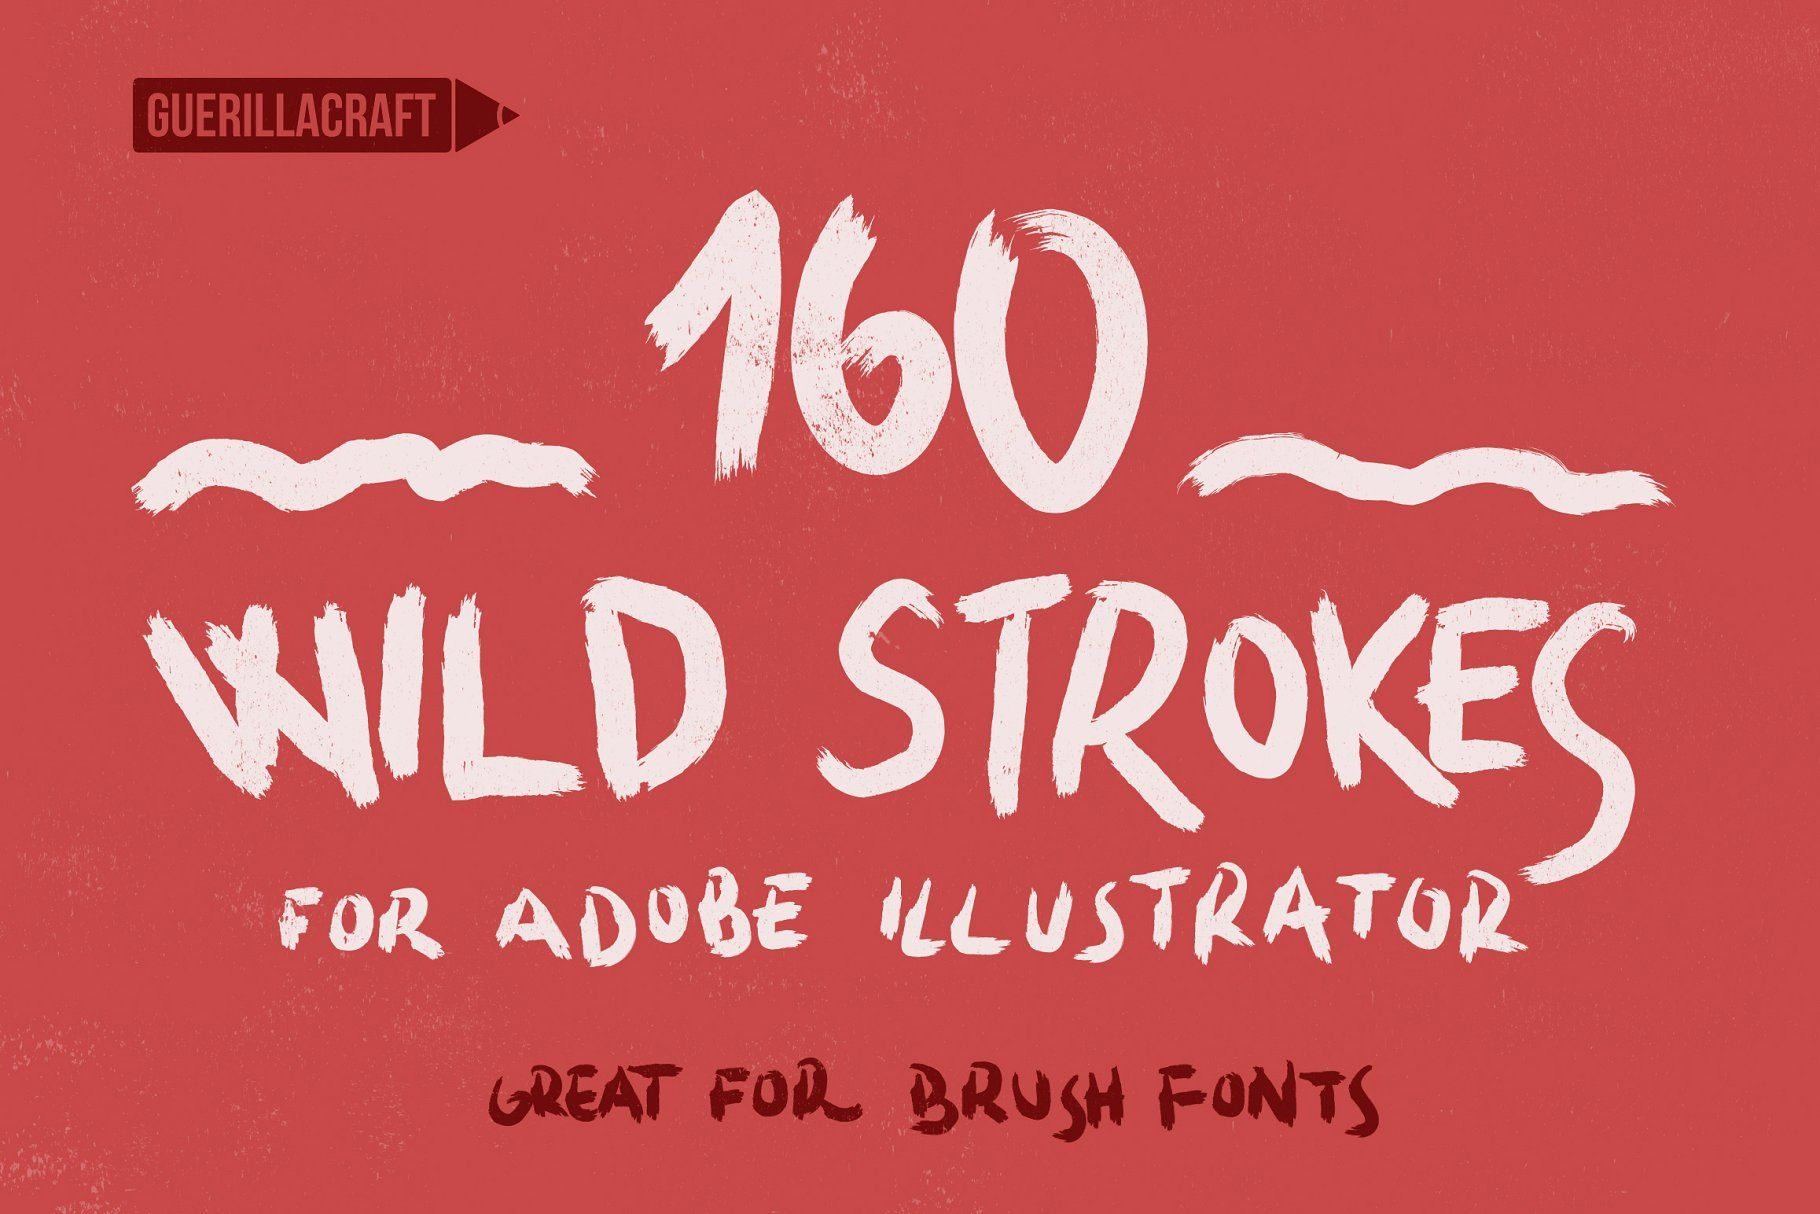 160 Wild Strokes For Illustrator Wild Strokes Brushes Illustrator